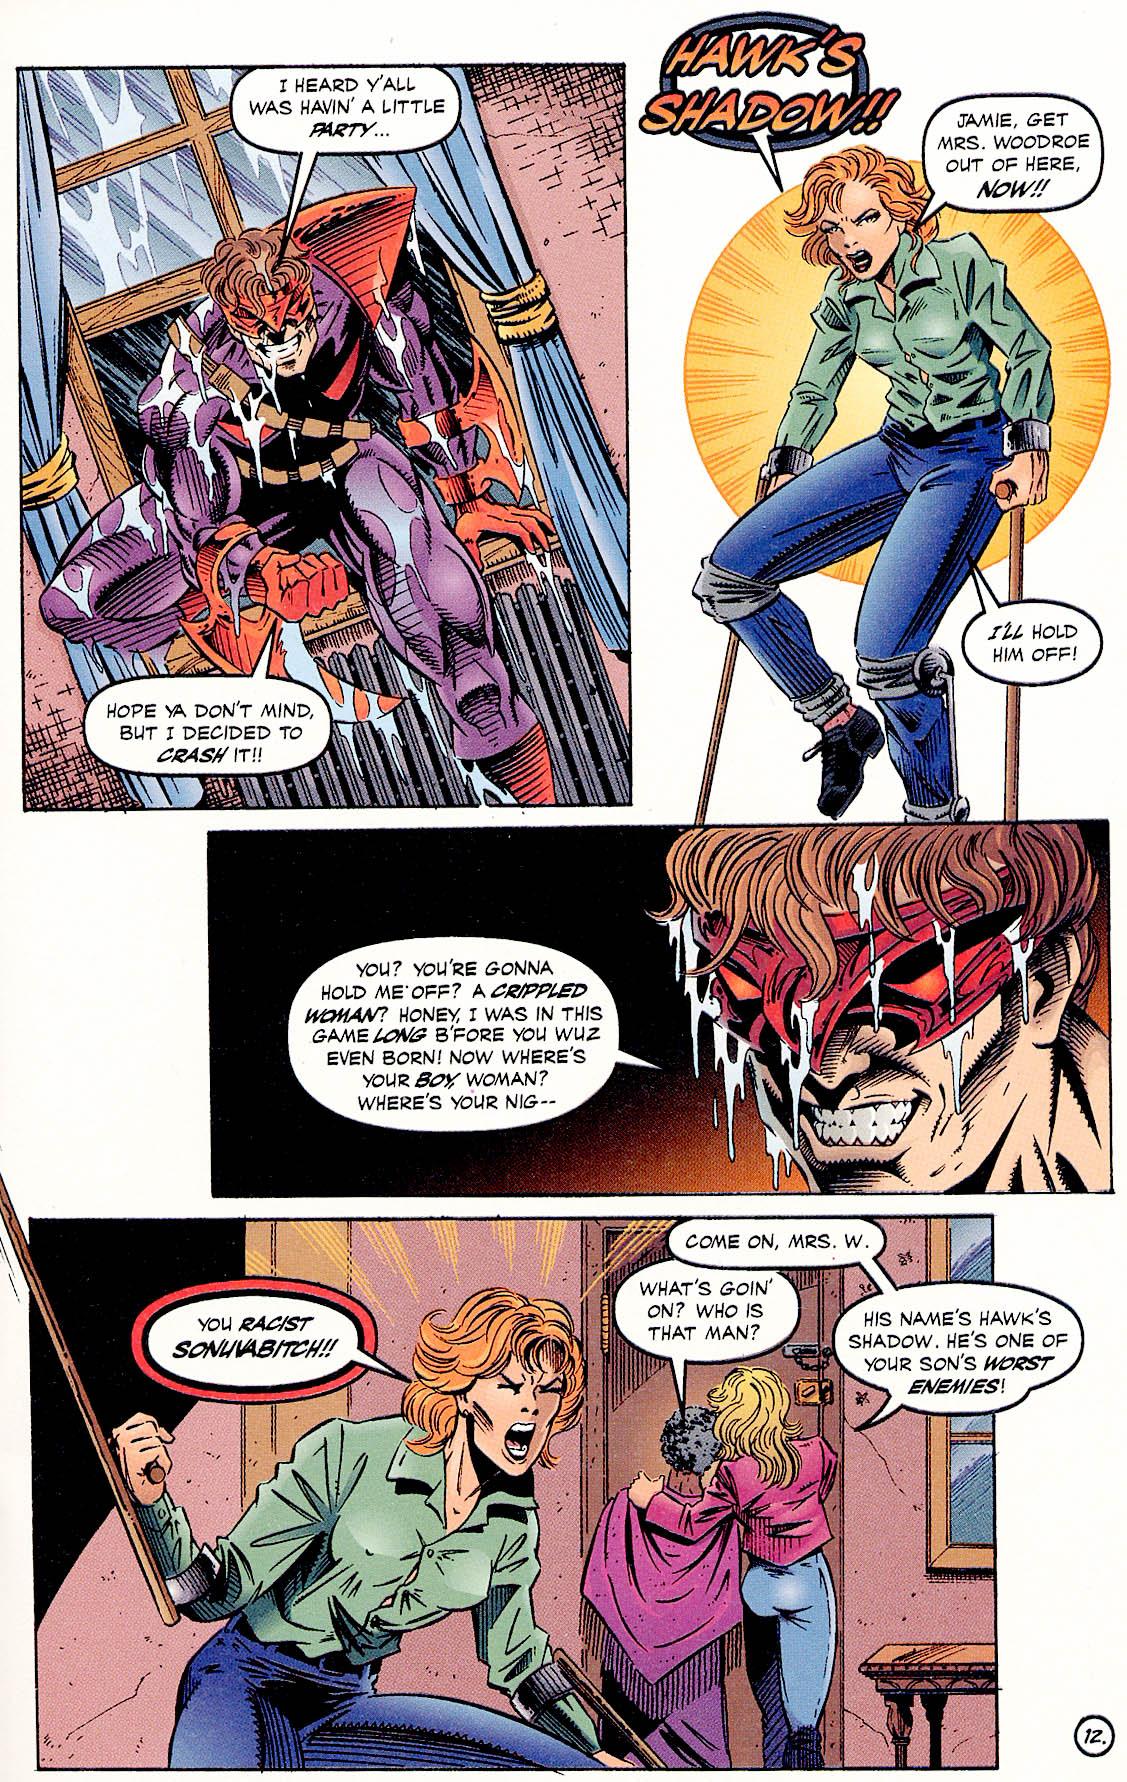 Read online ShadowHawk comic -  Issue #18 - 14